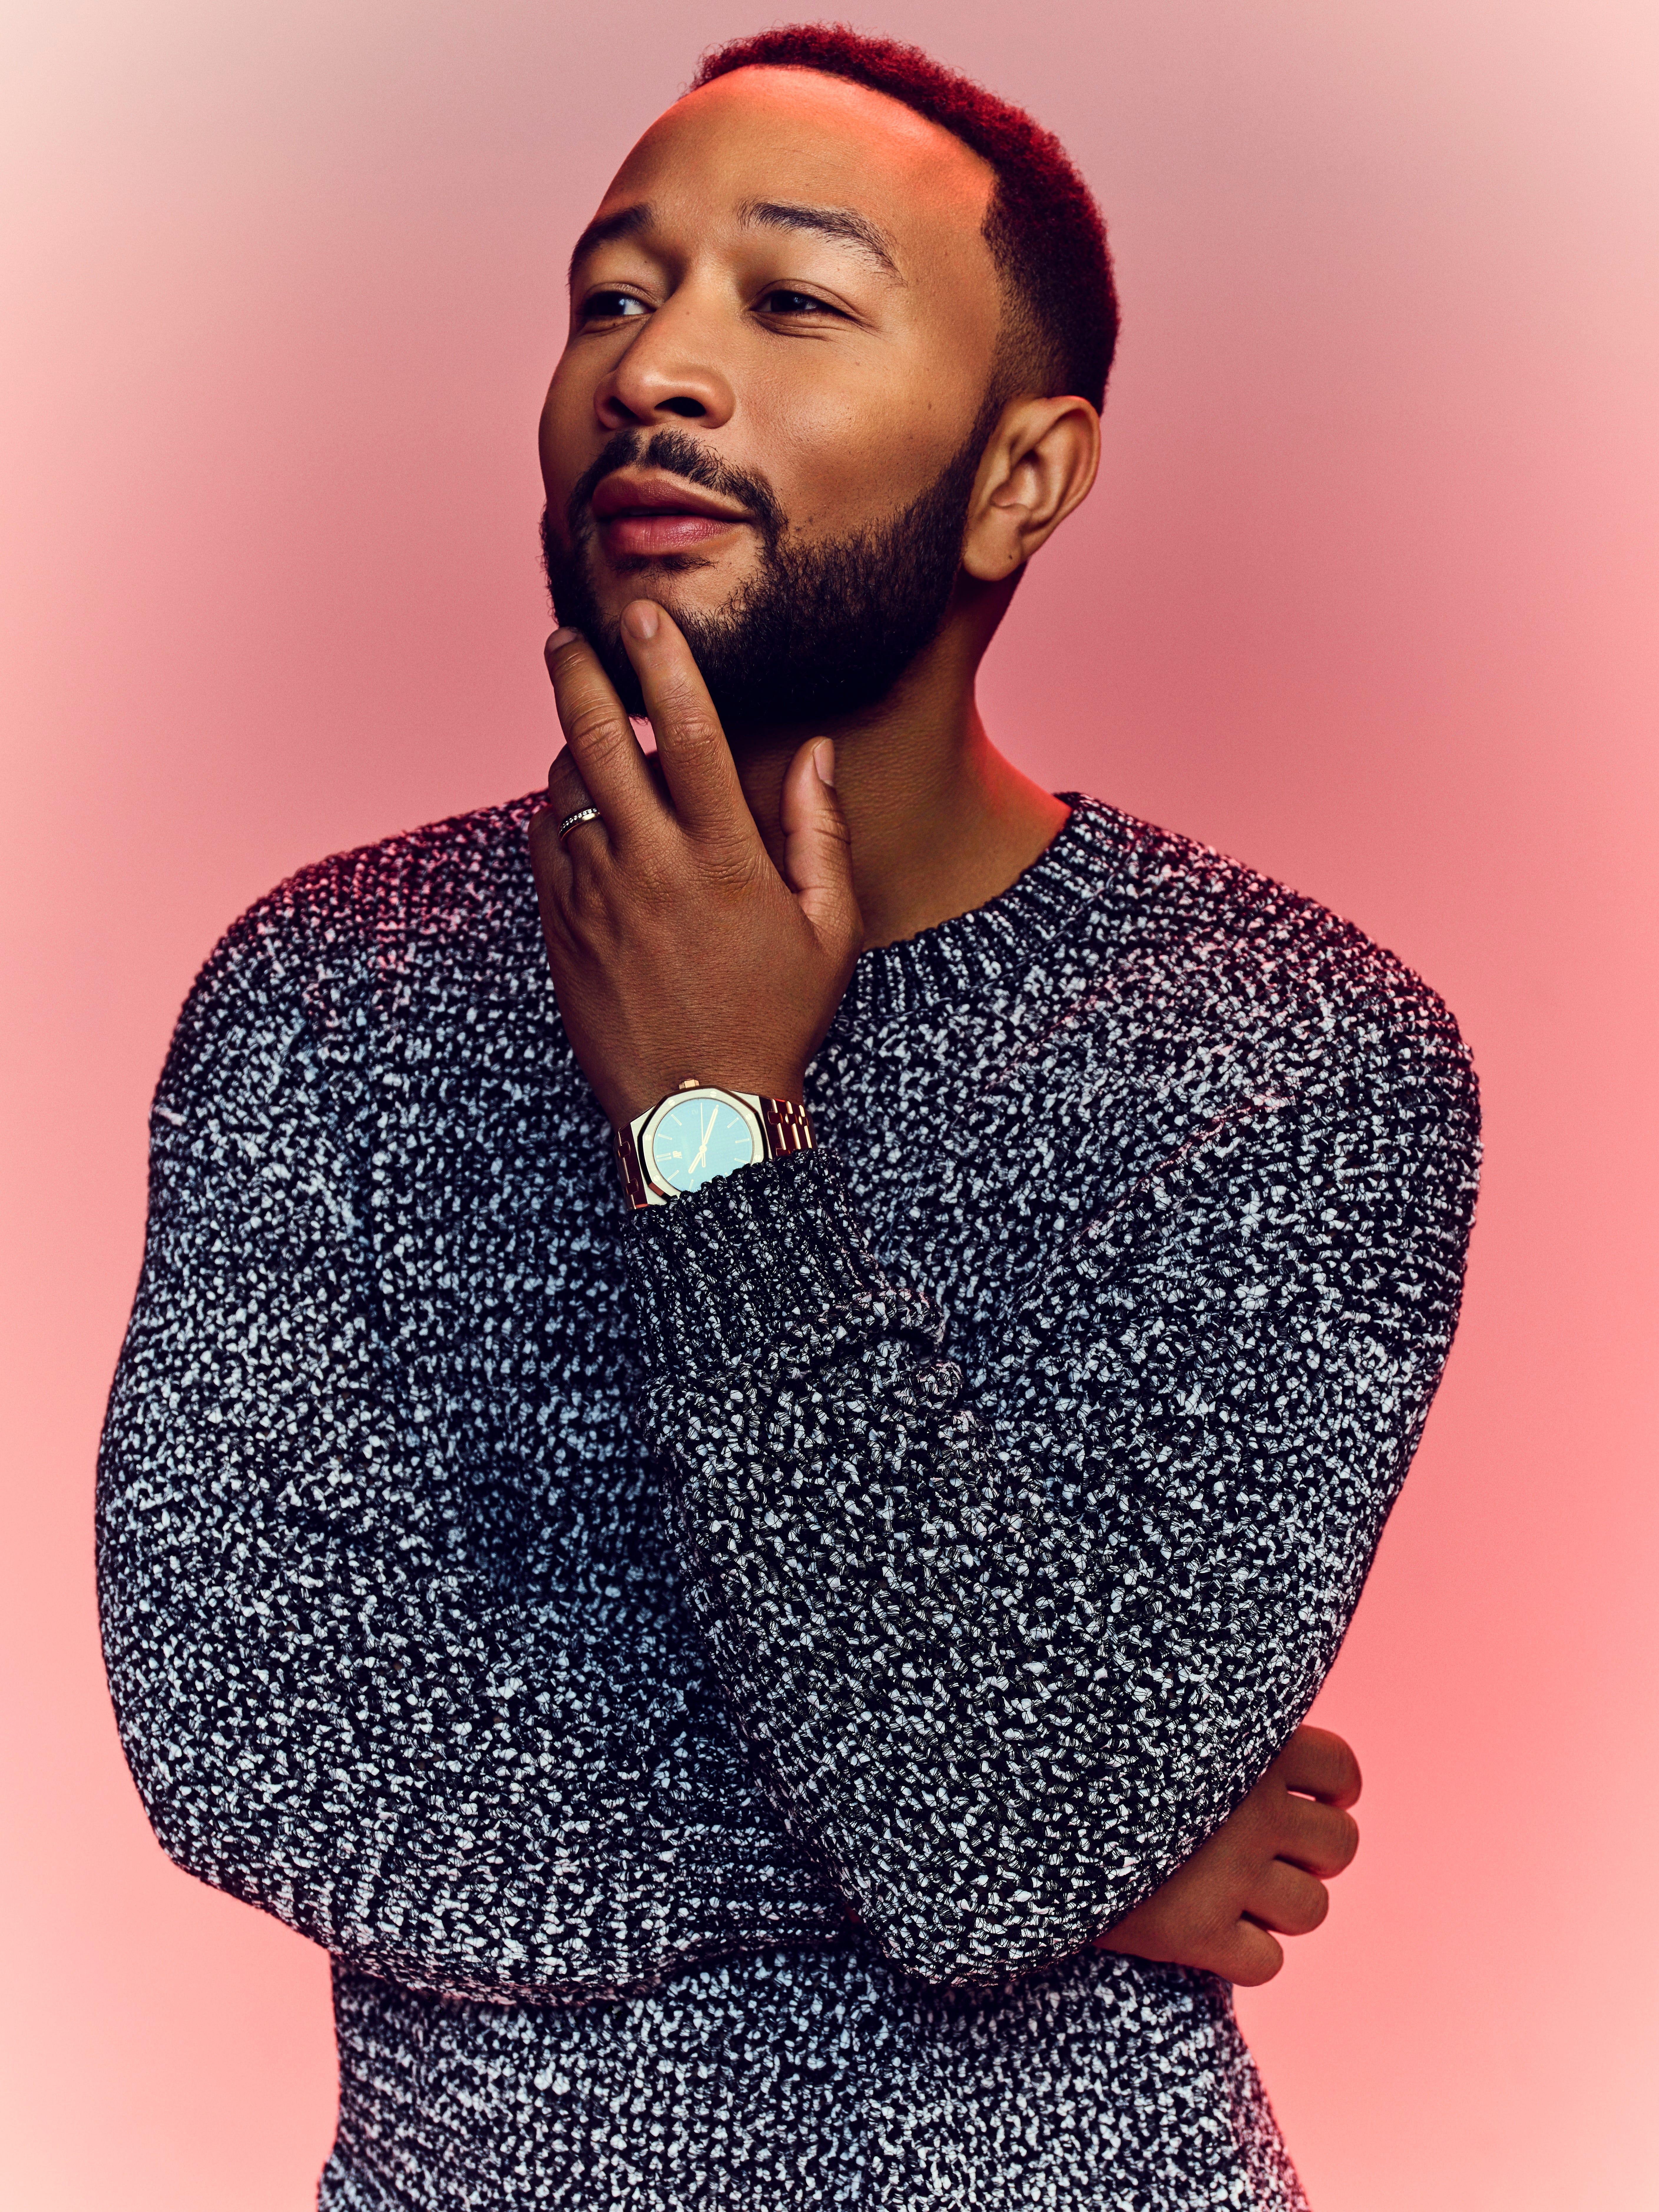 EGOT winner John Legend says new album  Bigger Love  is his  best work  yet